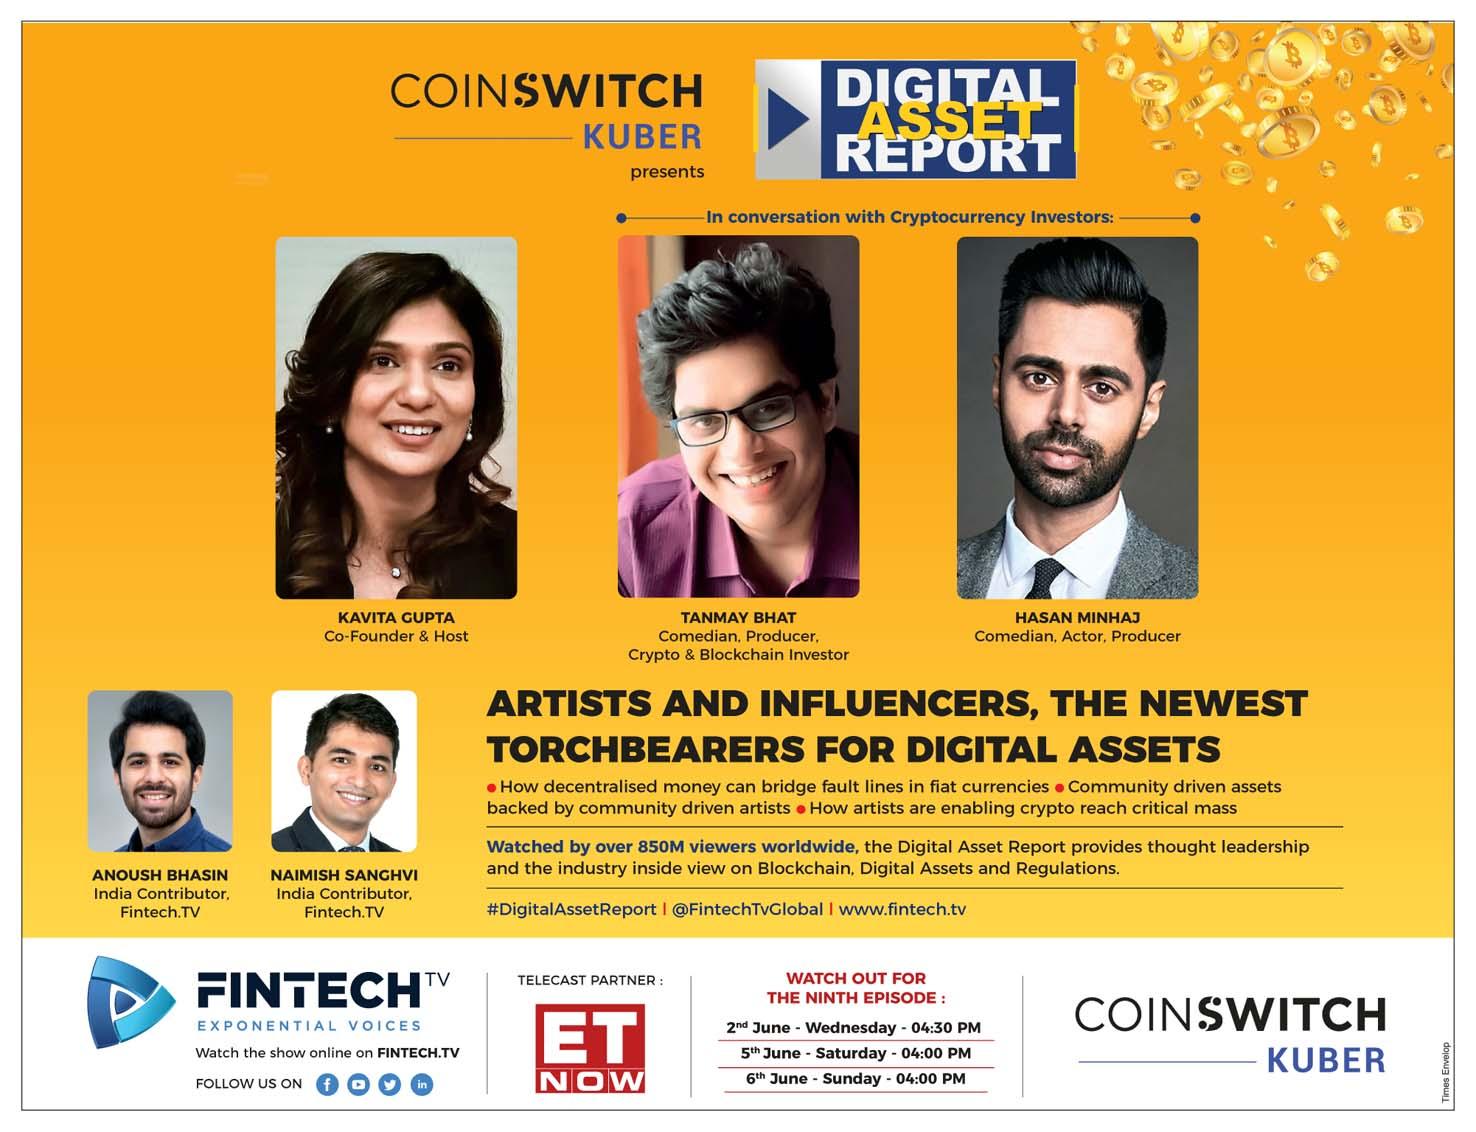 ET NOW - Digital Assets with Hasan Minhaj & Tanmay Baht